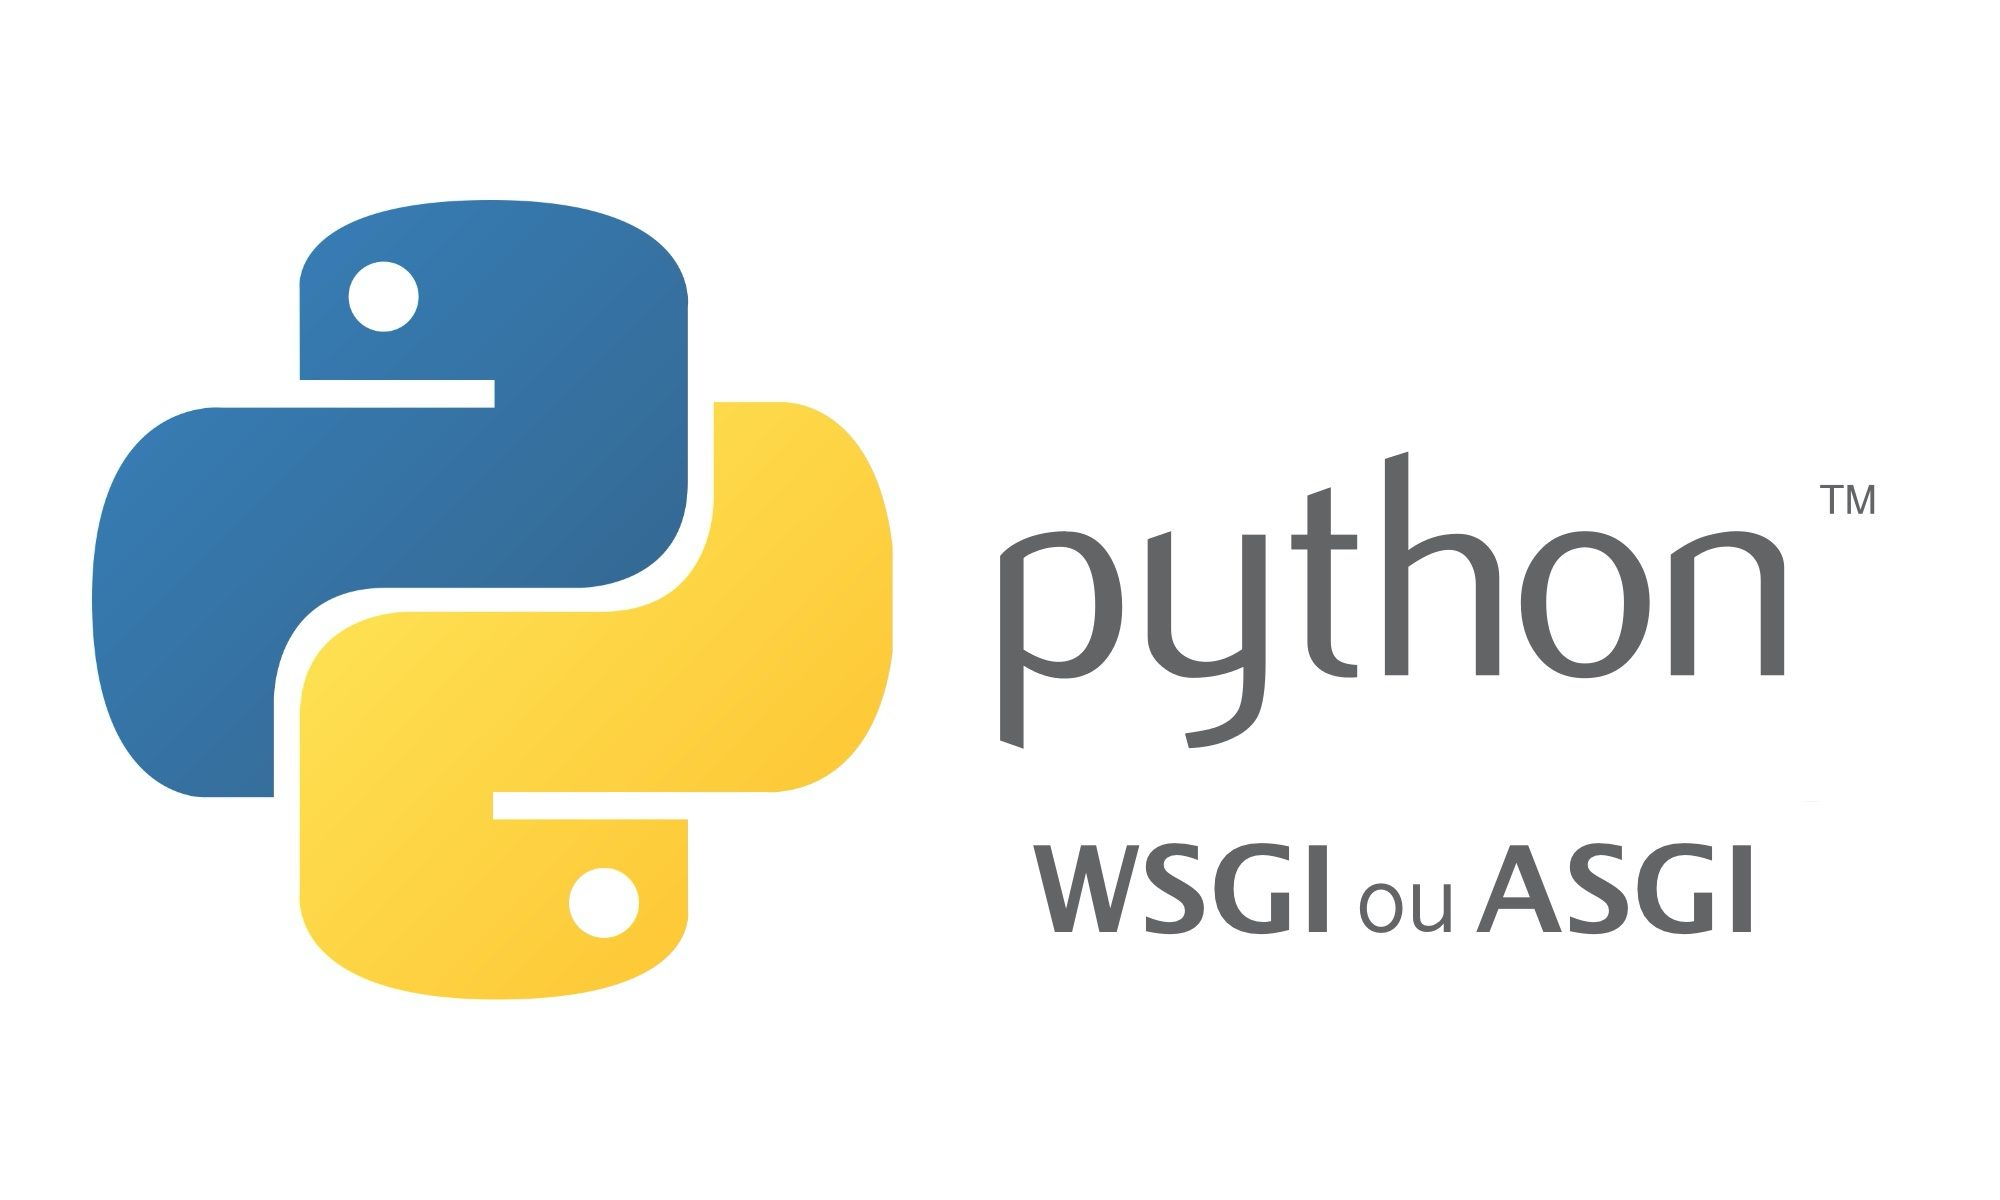 Python WSGI ASGI